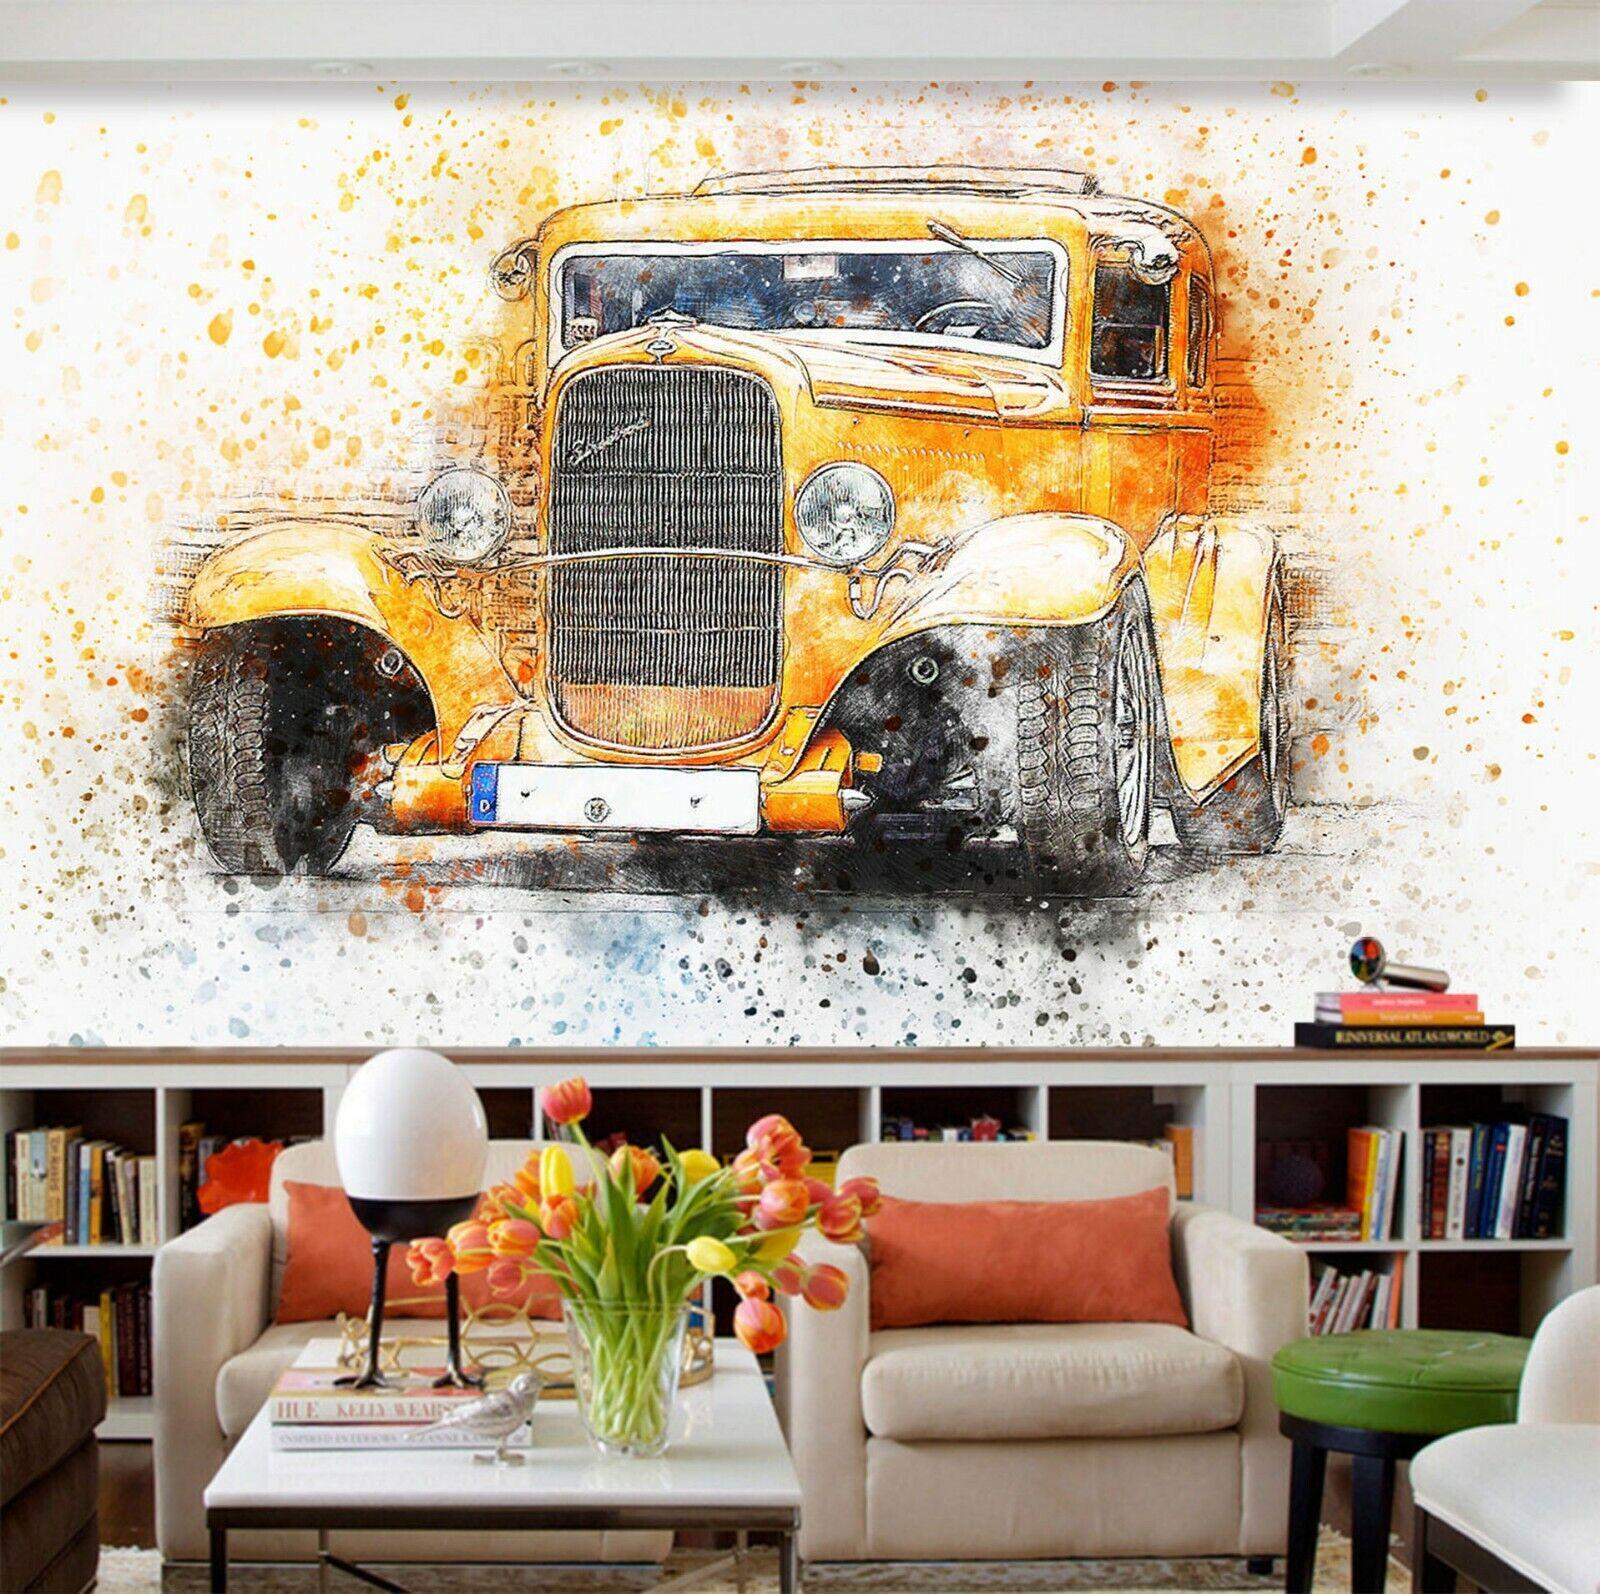 3D Vintage Car I95 Transport Wallpaper Mural Sefl-adhesive Removable Angelia